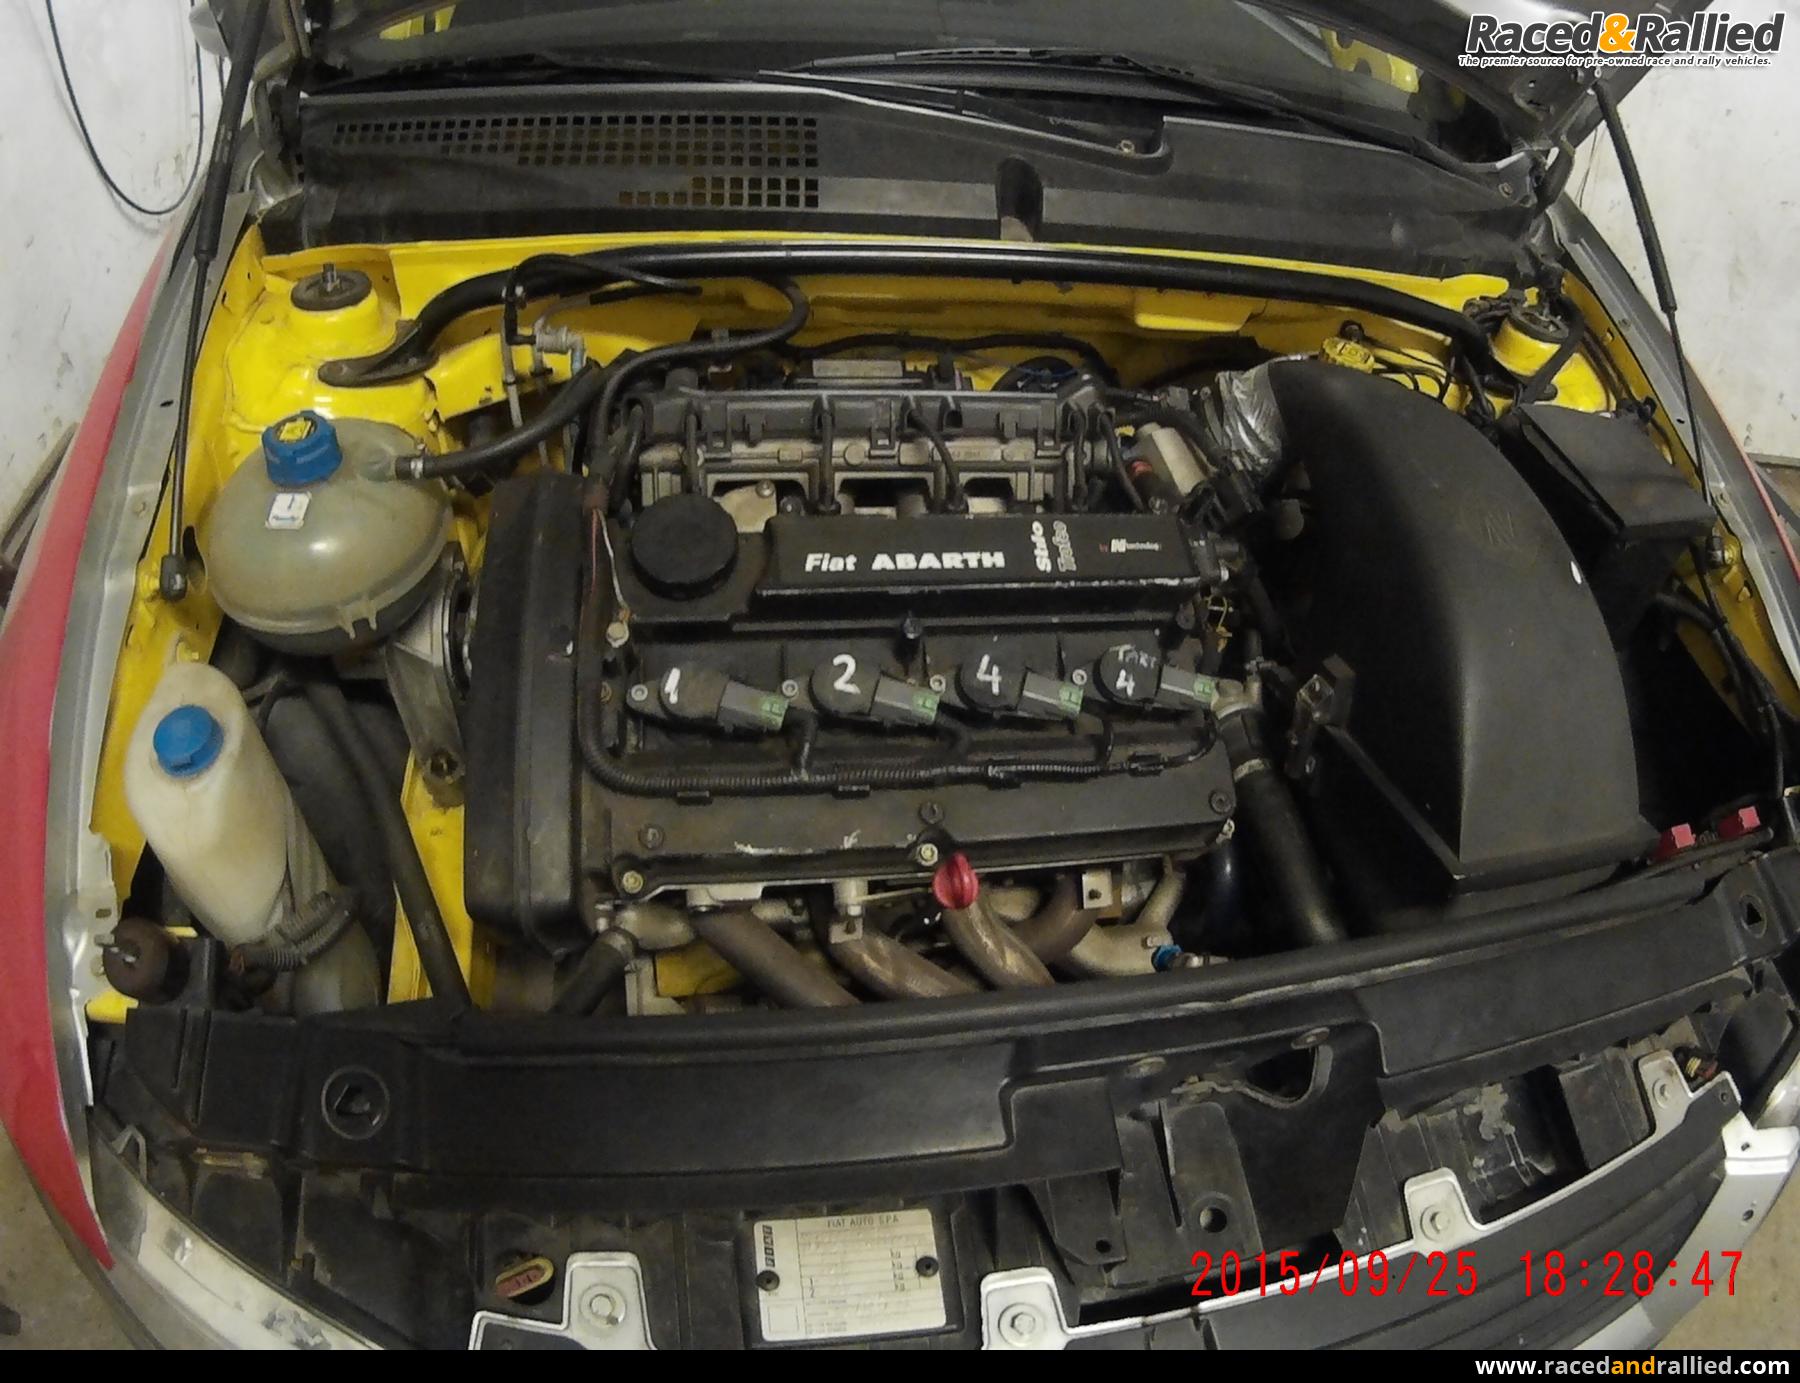 Cobra Kit Car >> Fiat Stilo Abarth Trophy | Rally Cars for sale at Raced & Rallied | rally cars for sale, race ...